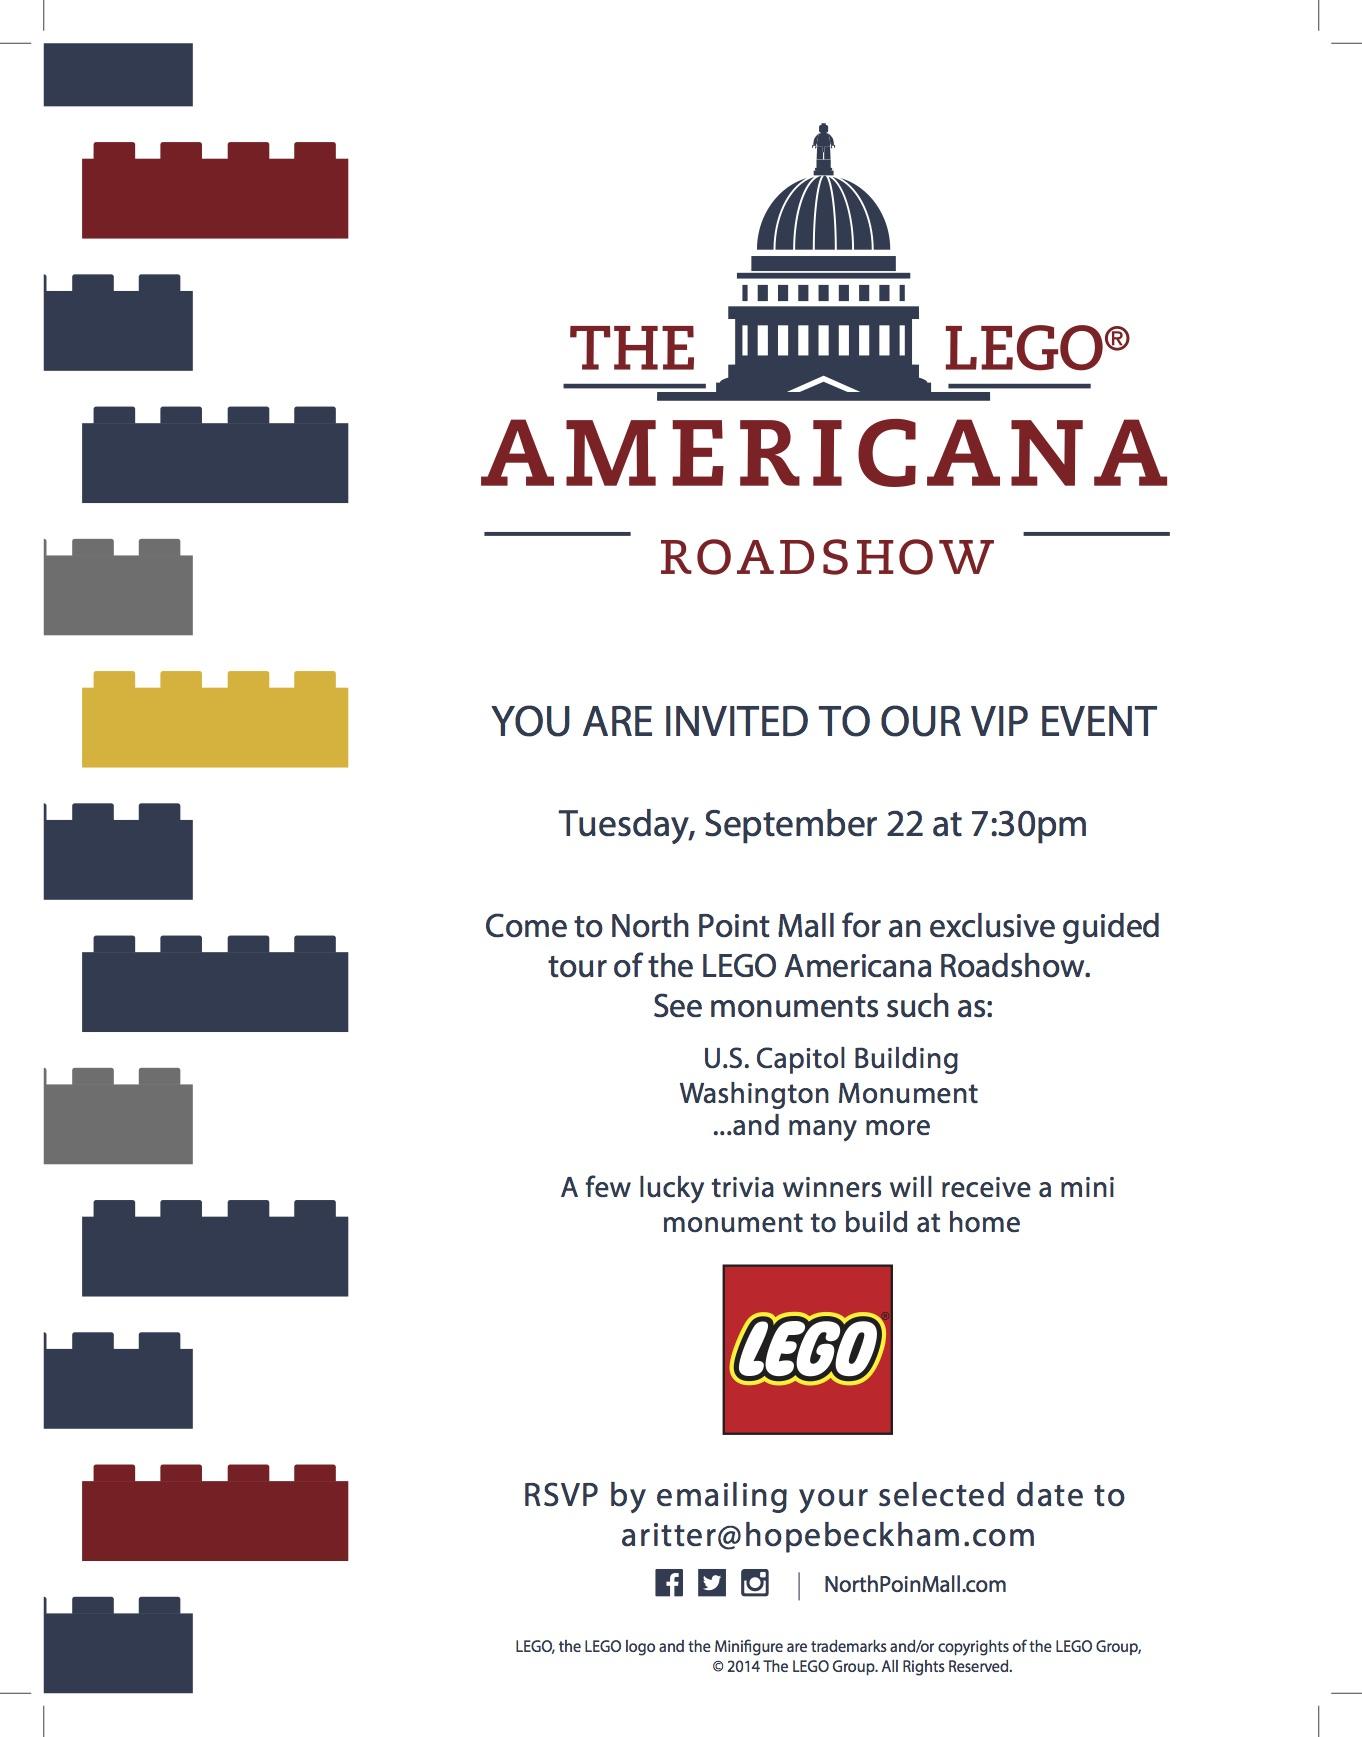 LEGO Americana Roadshow VIP Event Invitation